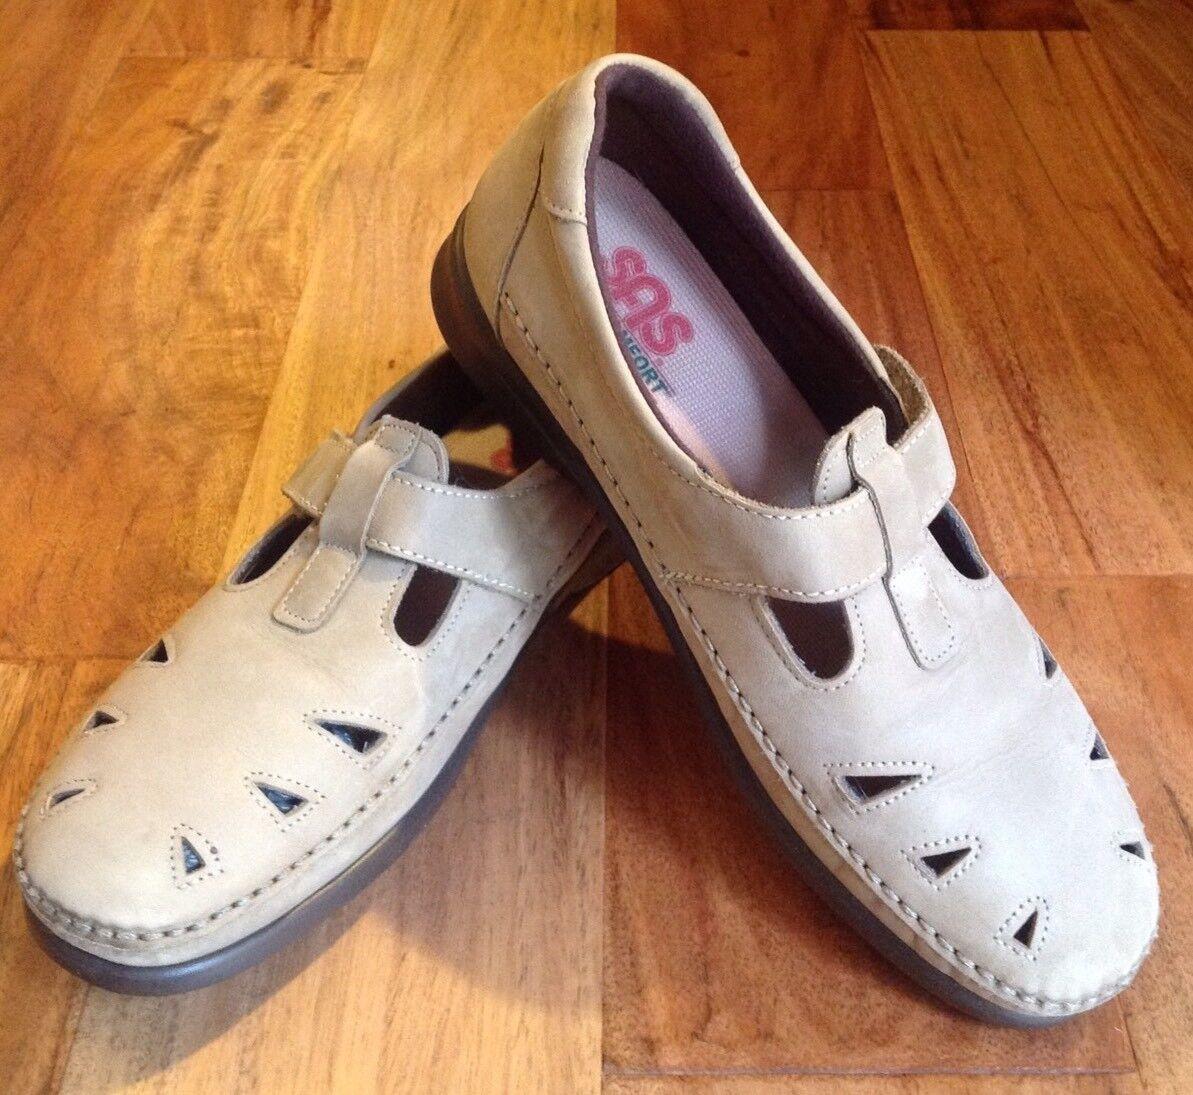 SAS Roamer 8.5 Beige Leather Mary Jane Moccasins Tripad Comfort shoes USA  168